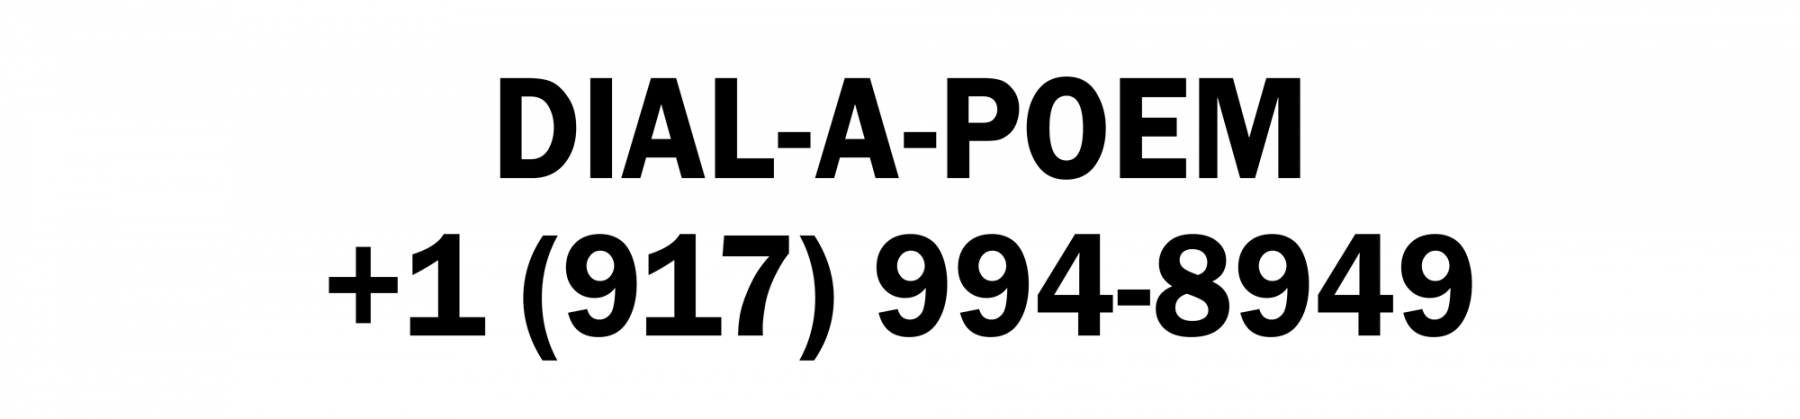 Dial-A-Poem: +1 (917) 994-8949